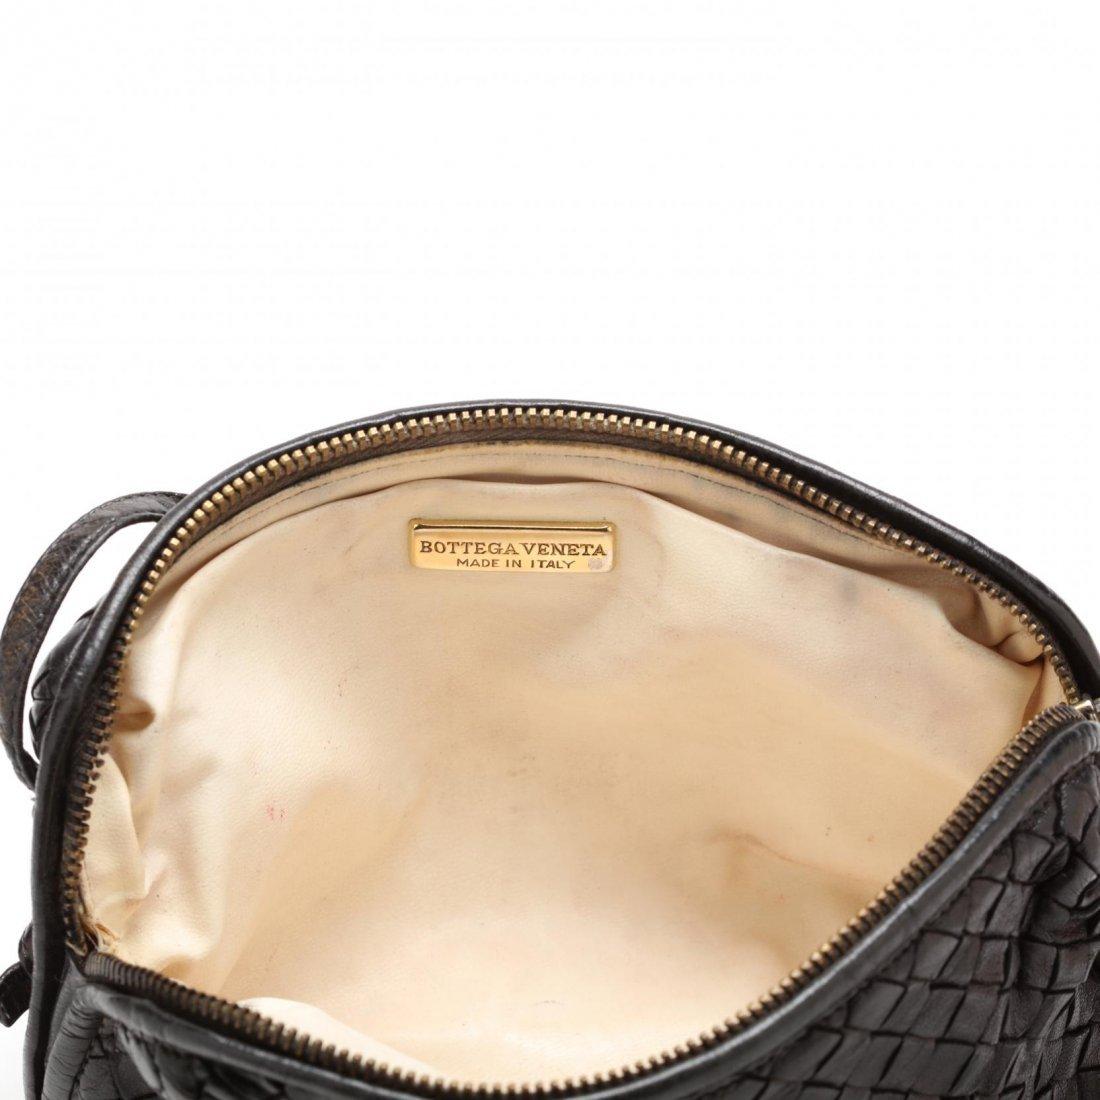 Two Cross-body Bags, Bottega Veneta - 4